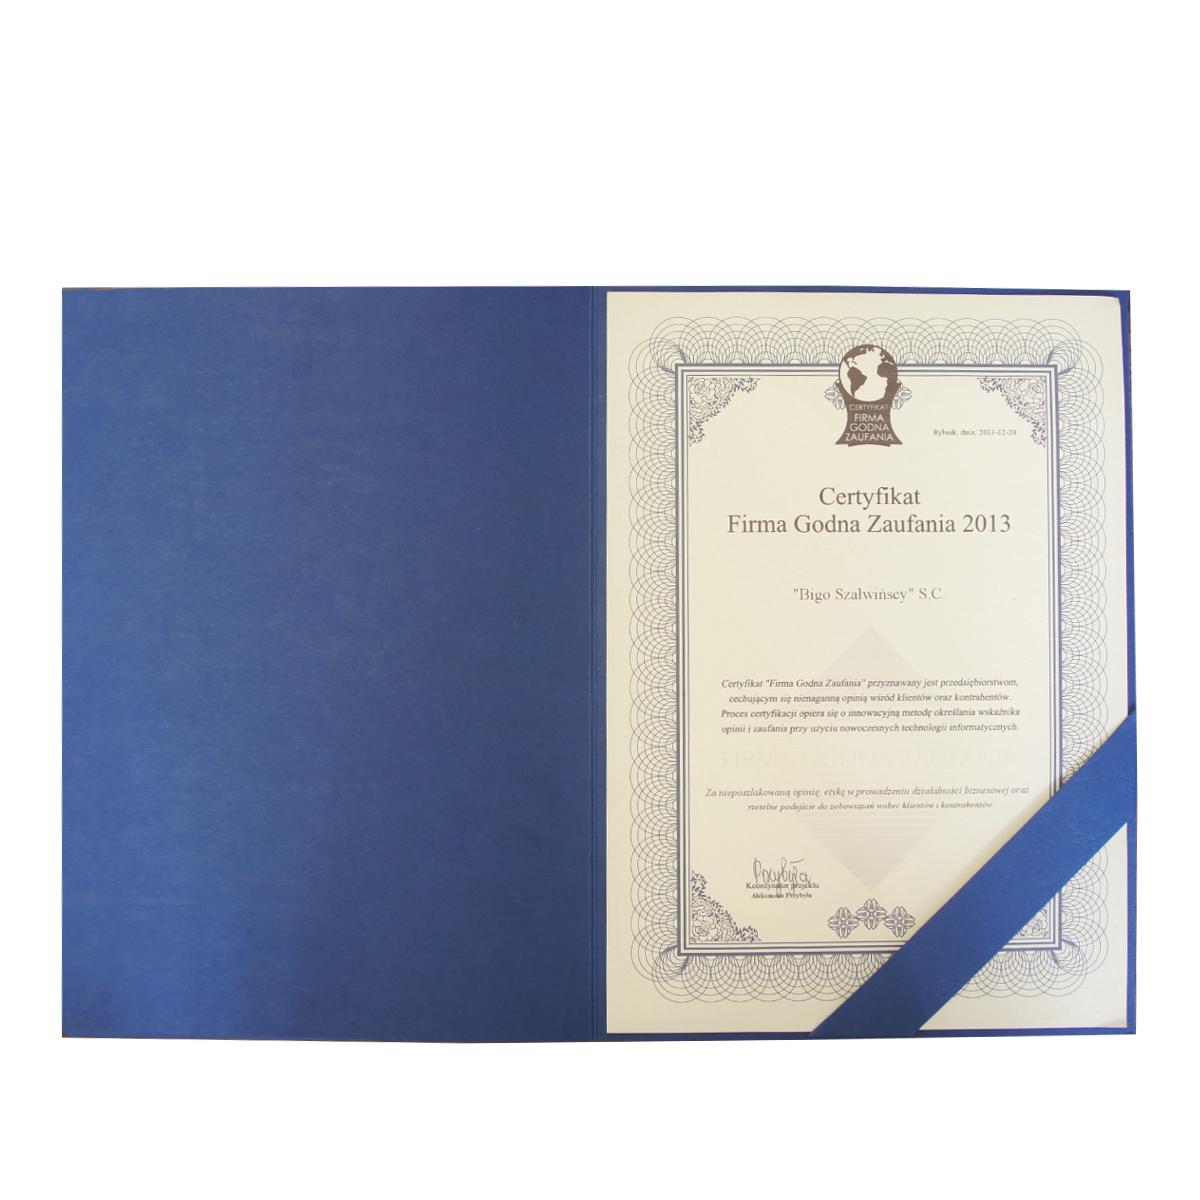 okładka-dyplom-otwarta